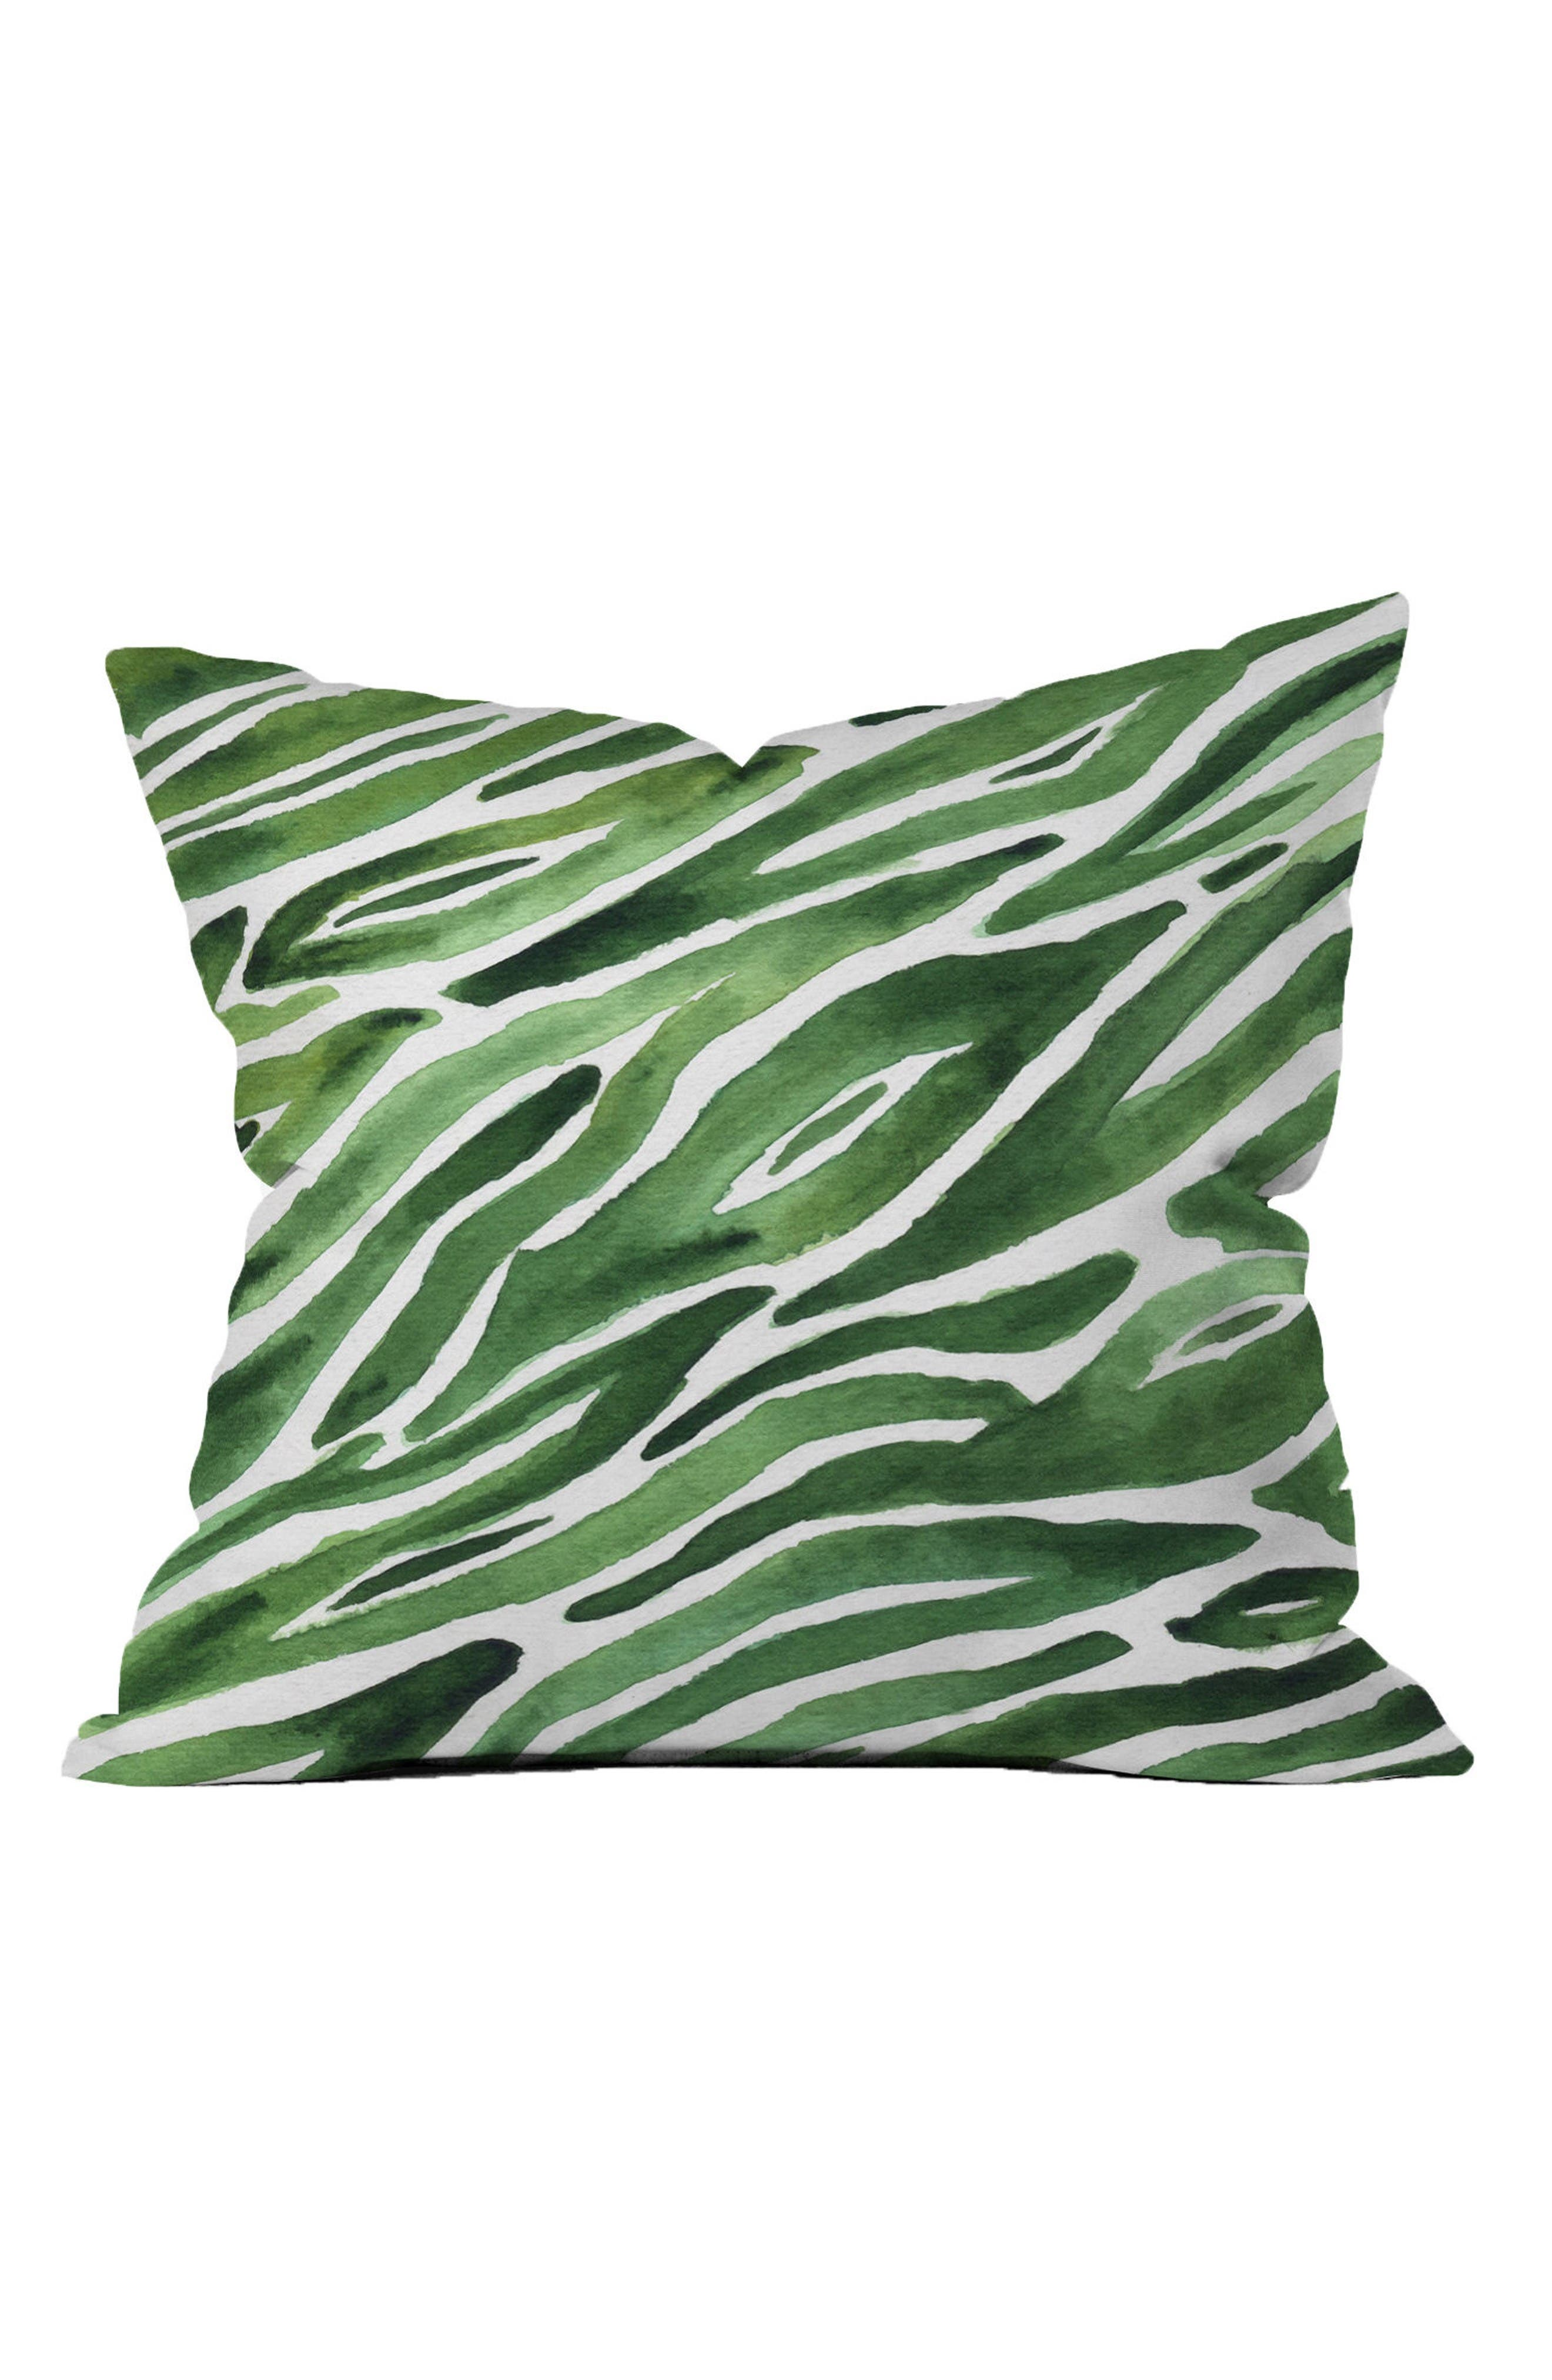 Main Image - Deny Designs Elena Blanco Accent Pillow